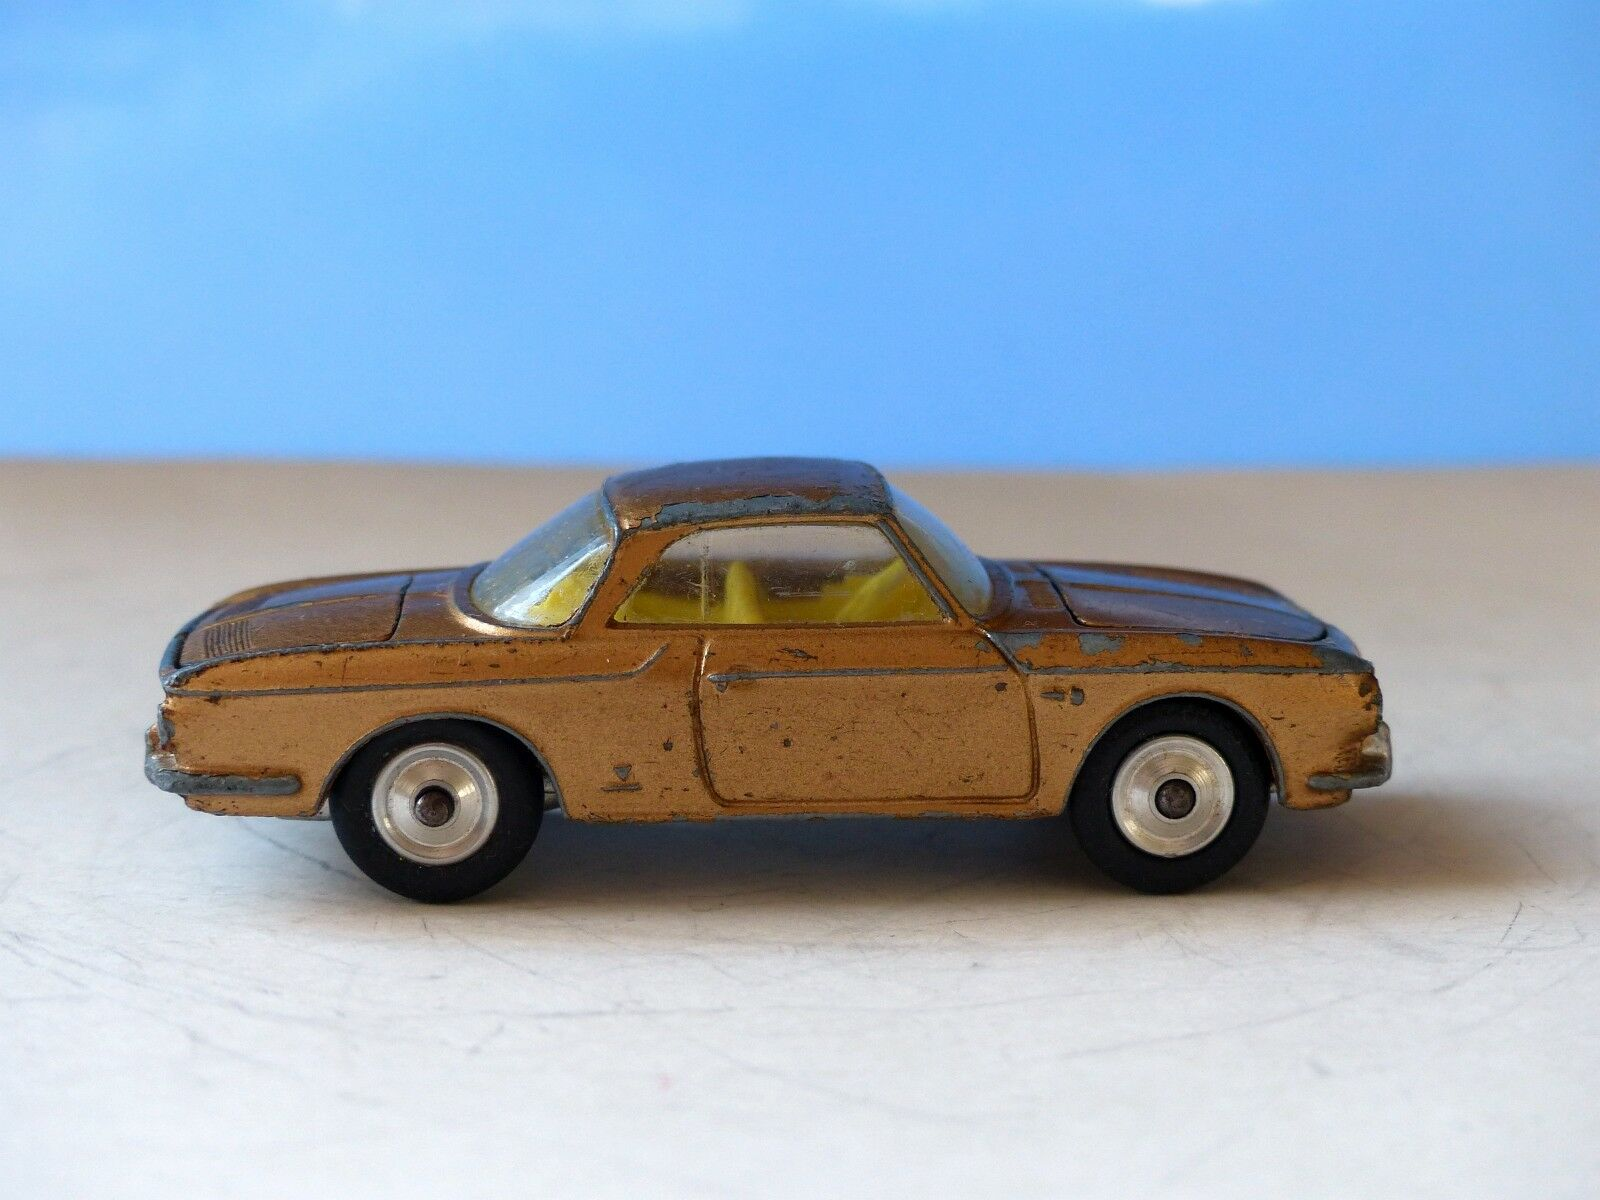 Corgi spielzeug 239 vw 1500 karmann ghia in Gold, gelbe innenausstattung